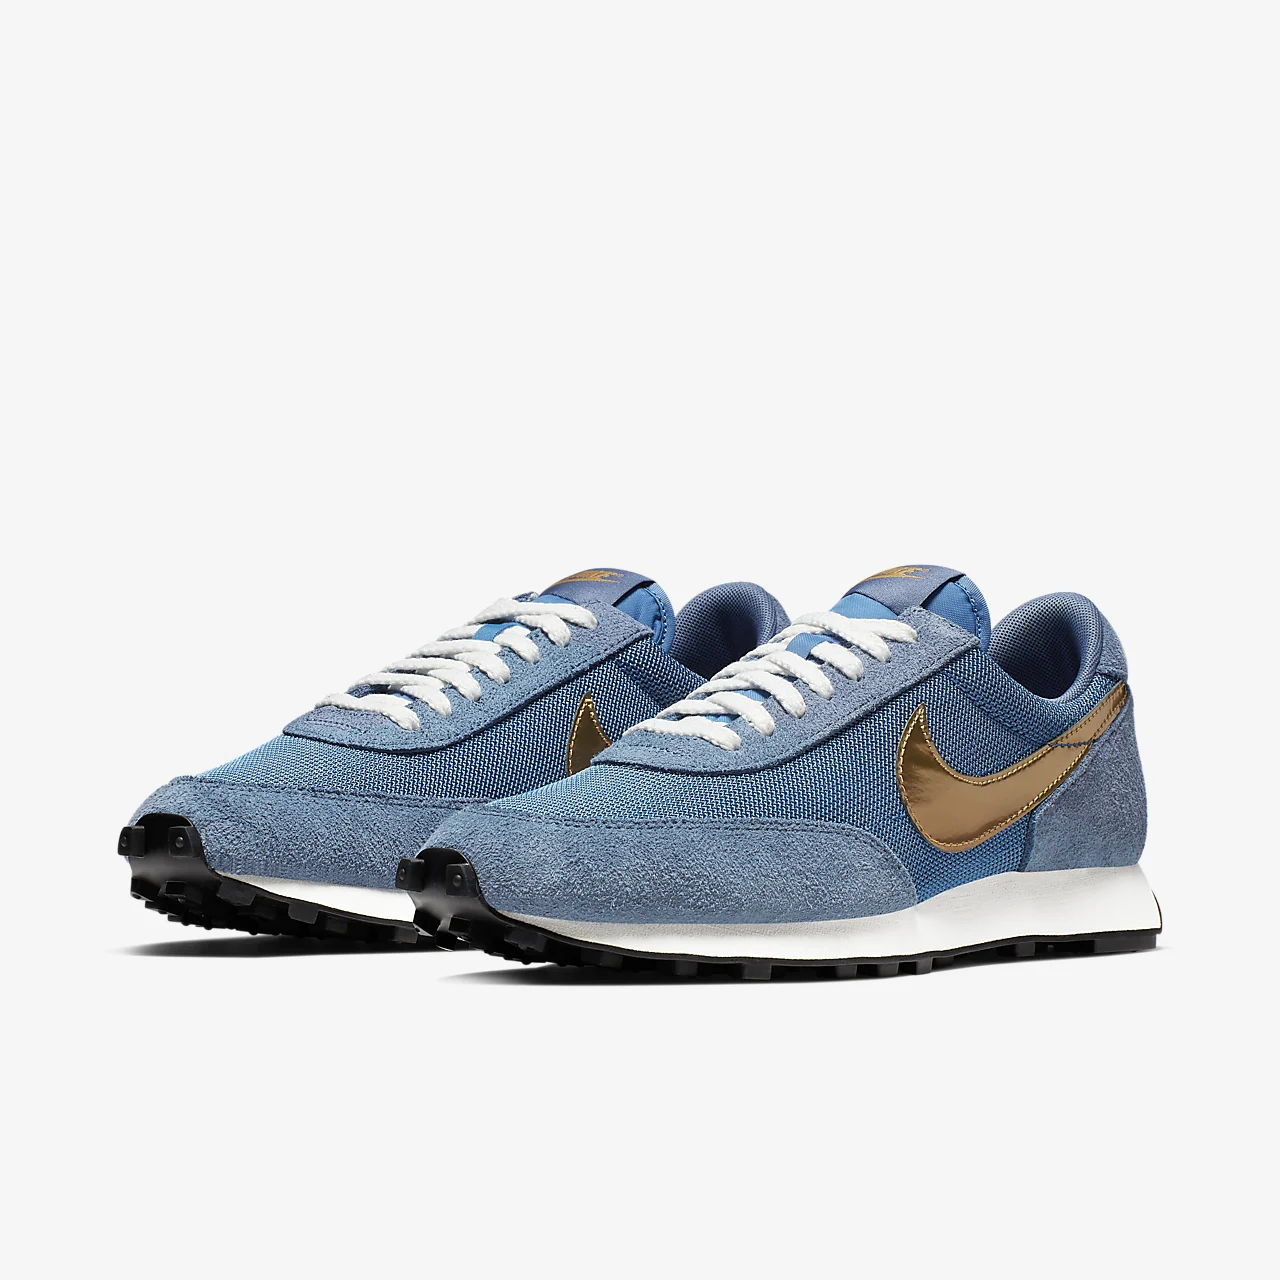 Nike Daybreak SP Men's Shoe BV7725-400